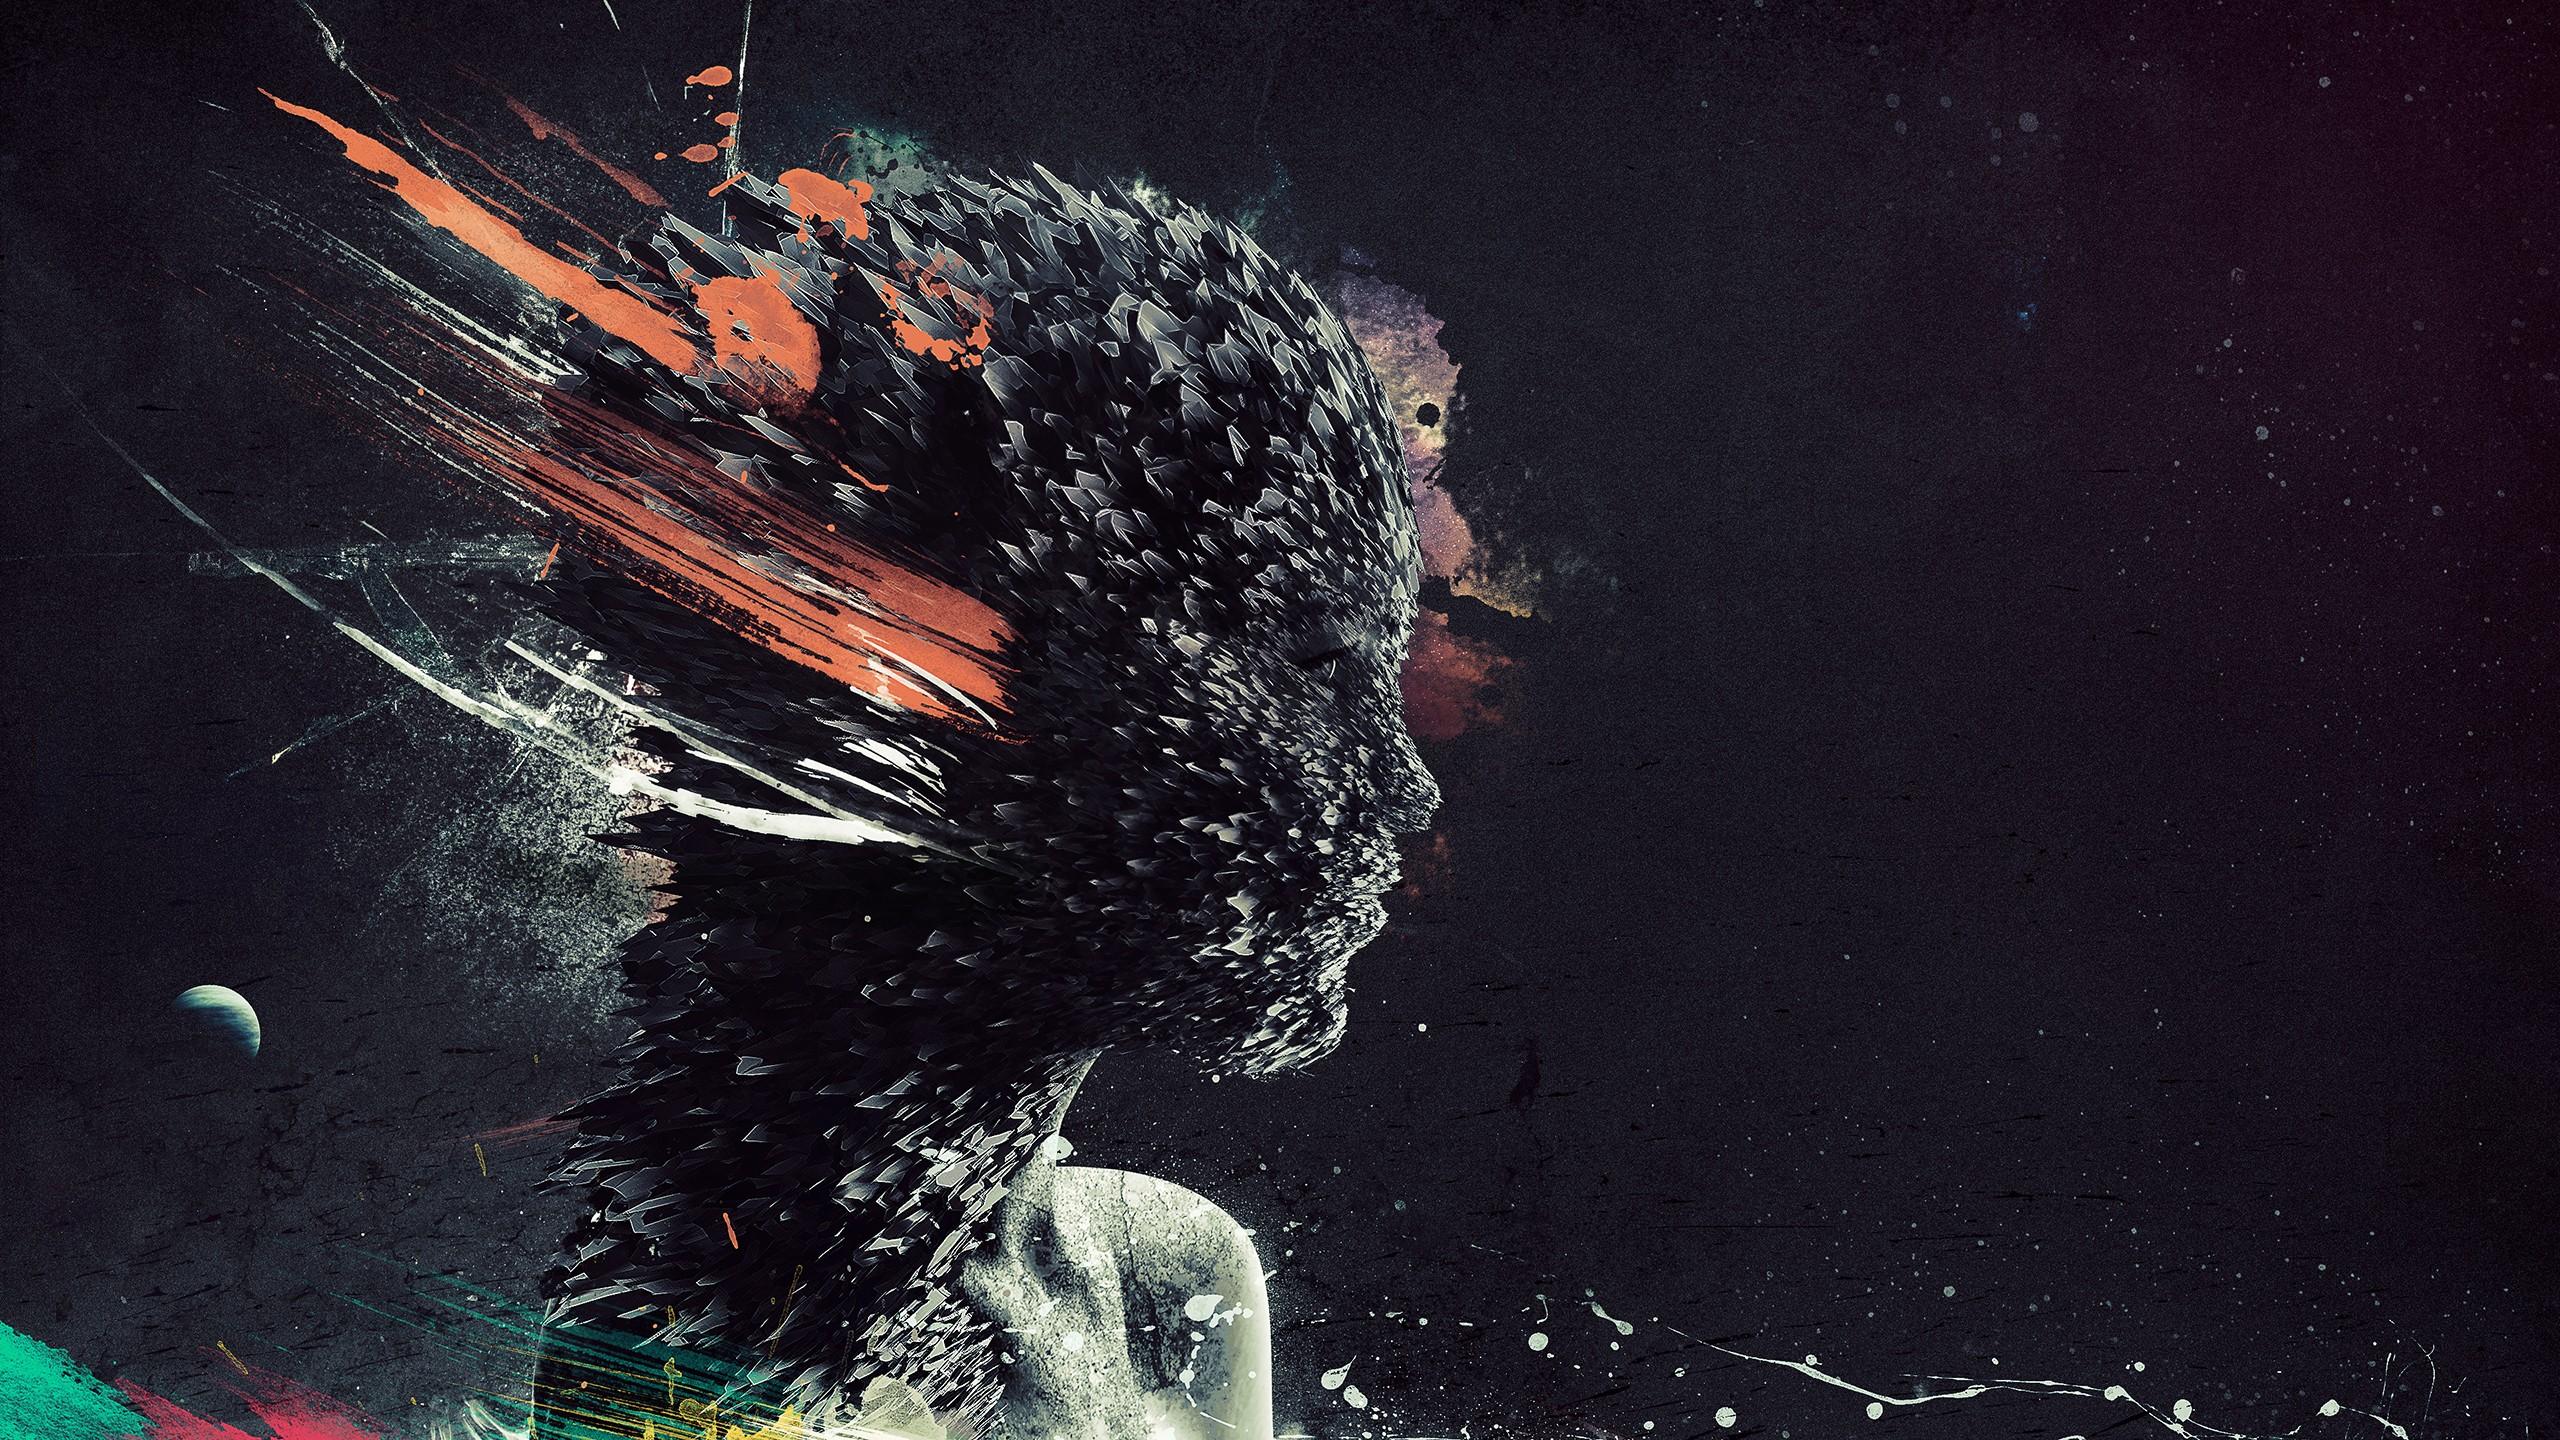 Digital Abstract Art Wallpapers 2560x1440